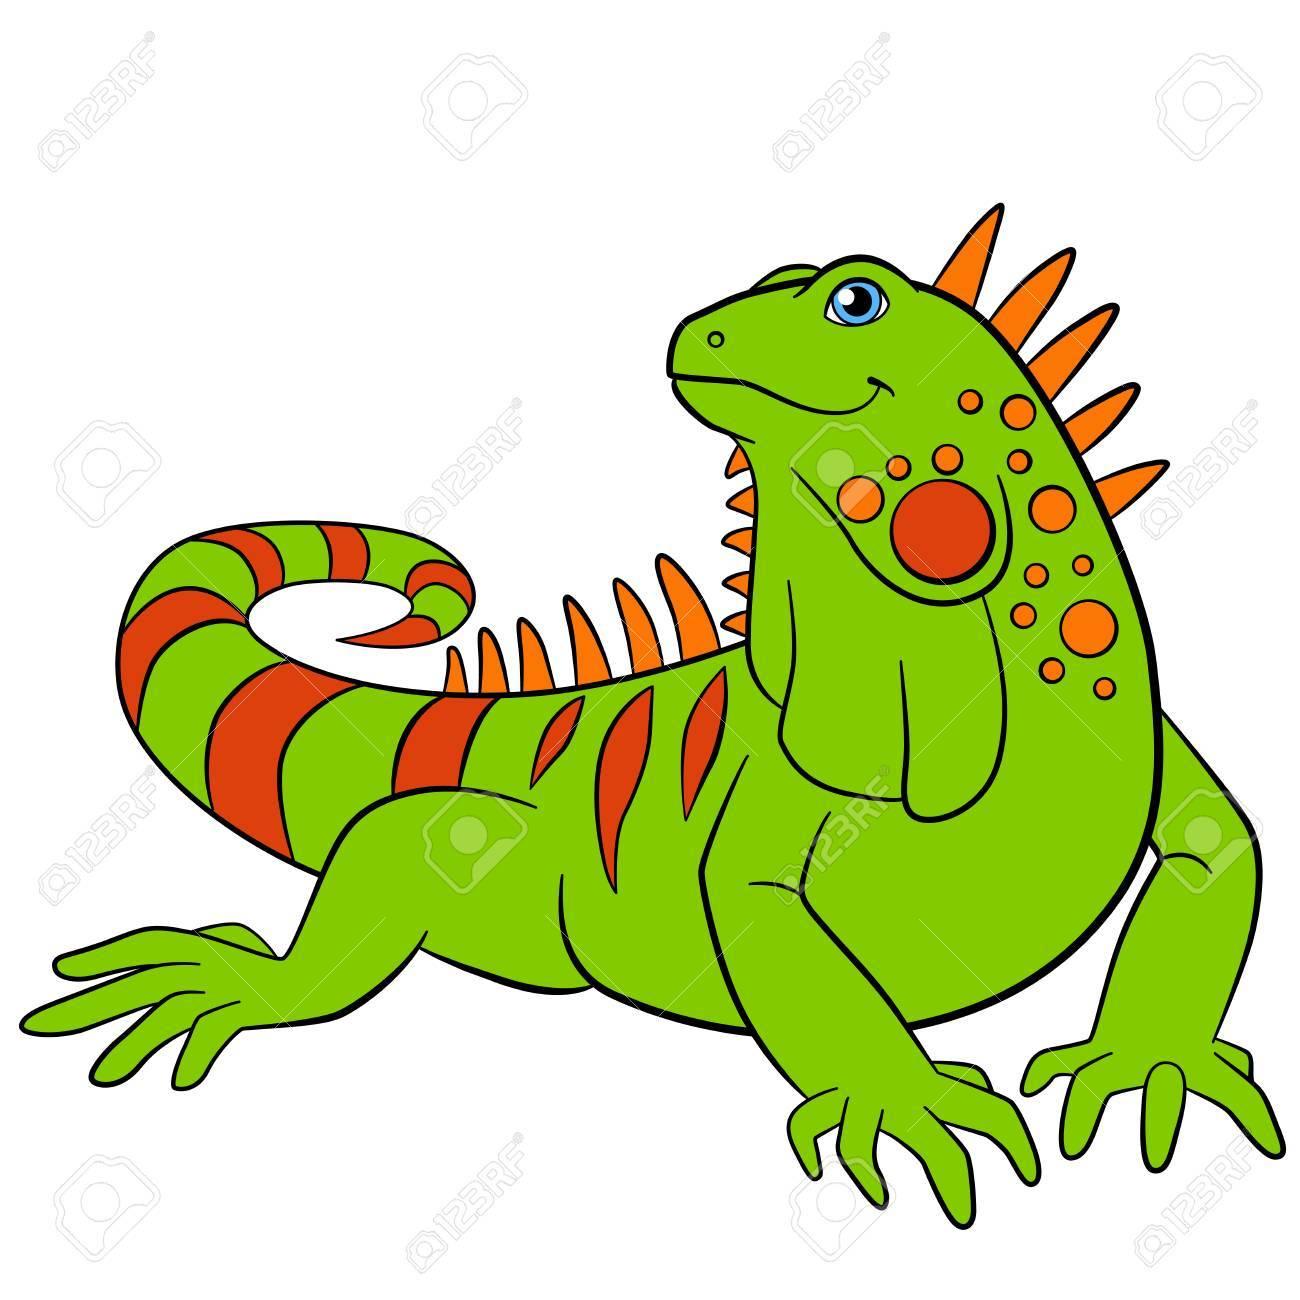 cartoon animals cute green iguana sits and smiles royalty free rh 123rf com cuban rock iguana clipart iguana silhouette free clip art